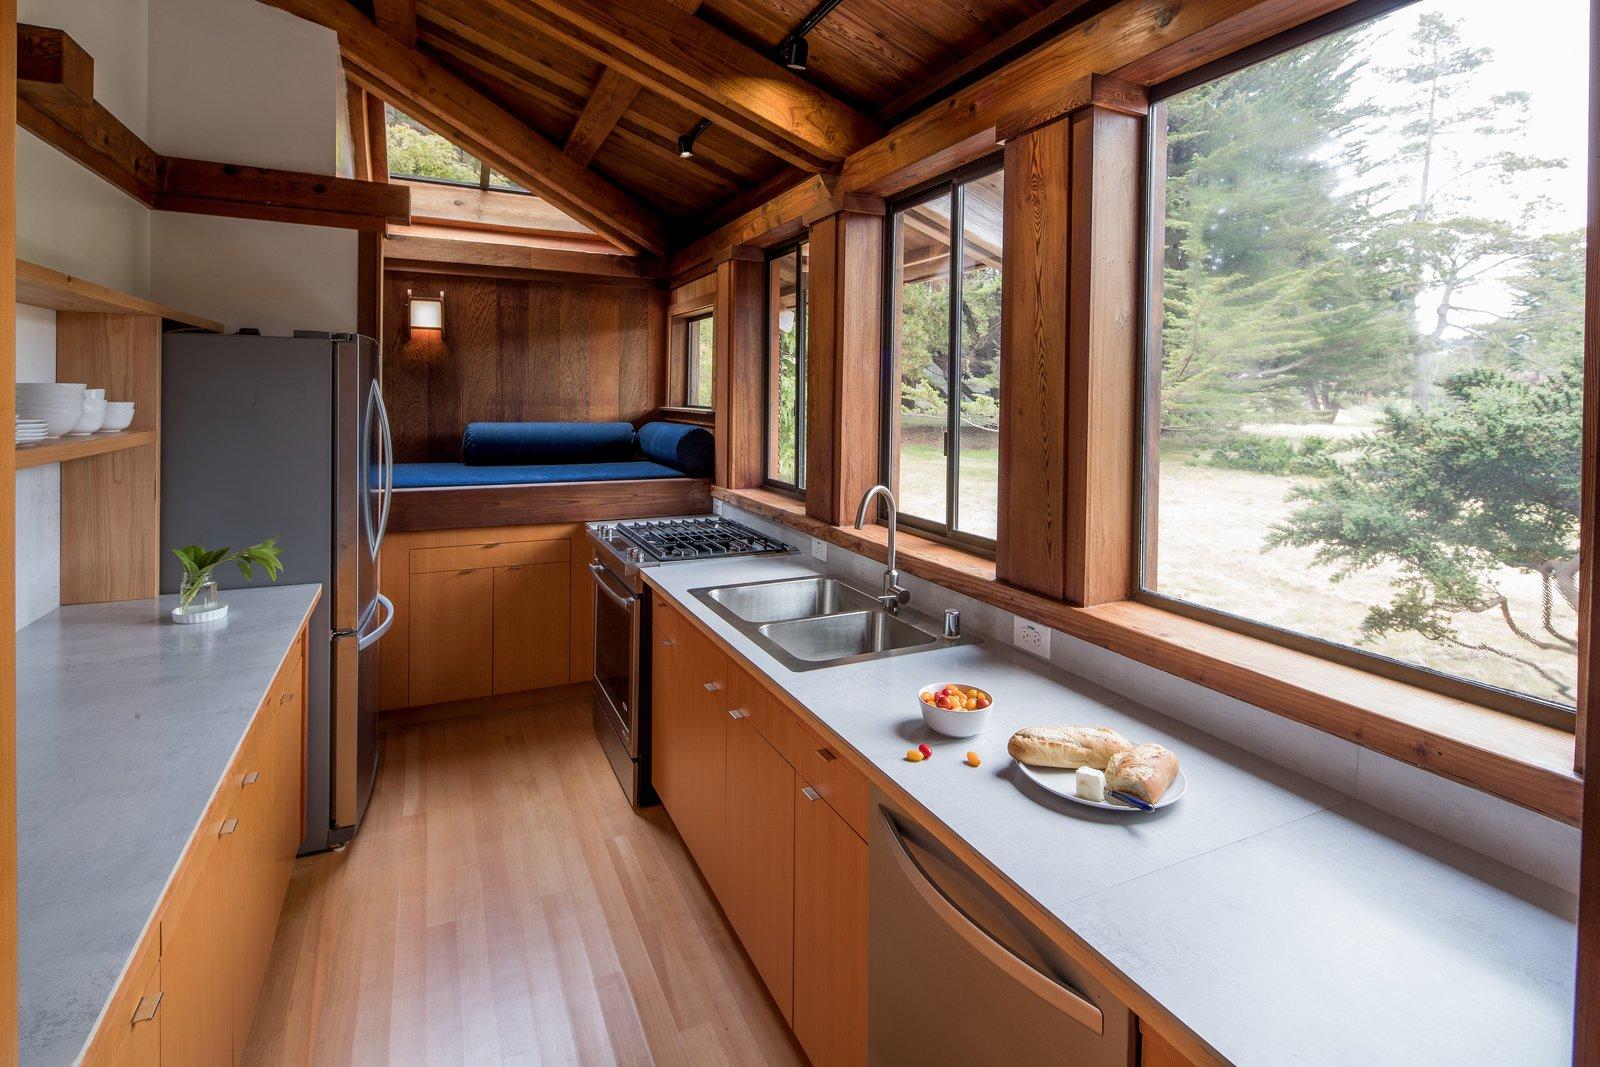 Kitchen, Wood Cabinet, Light Hardwood Floor, Track Lighting, Drop In Sink, Range, and Concrete Counter  Best Photos from Hinoki House